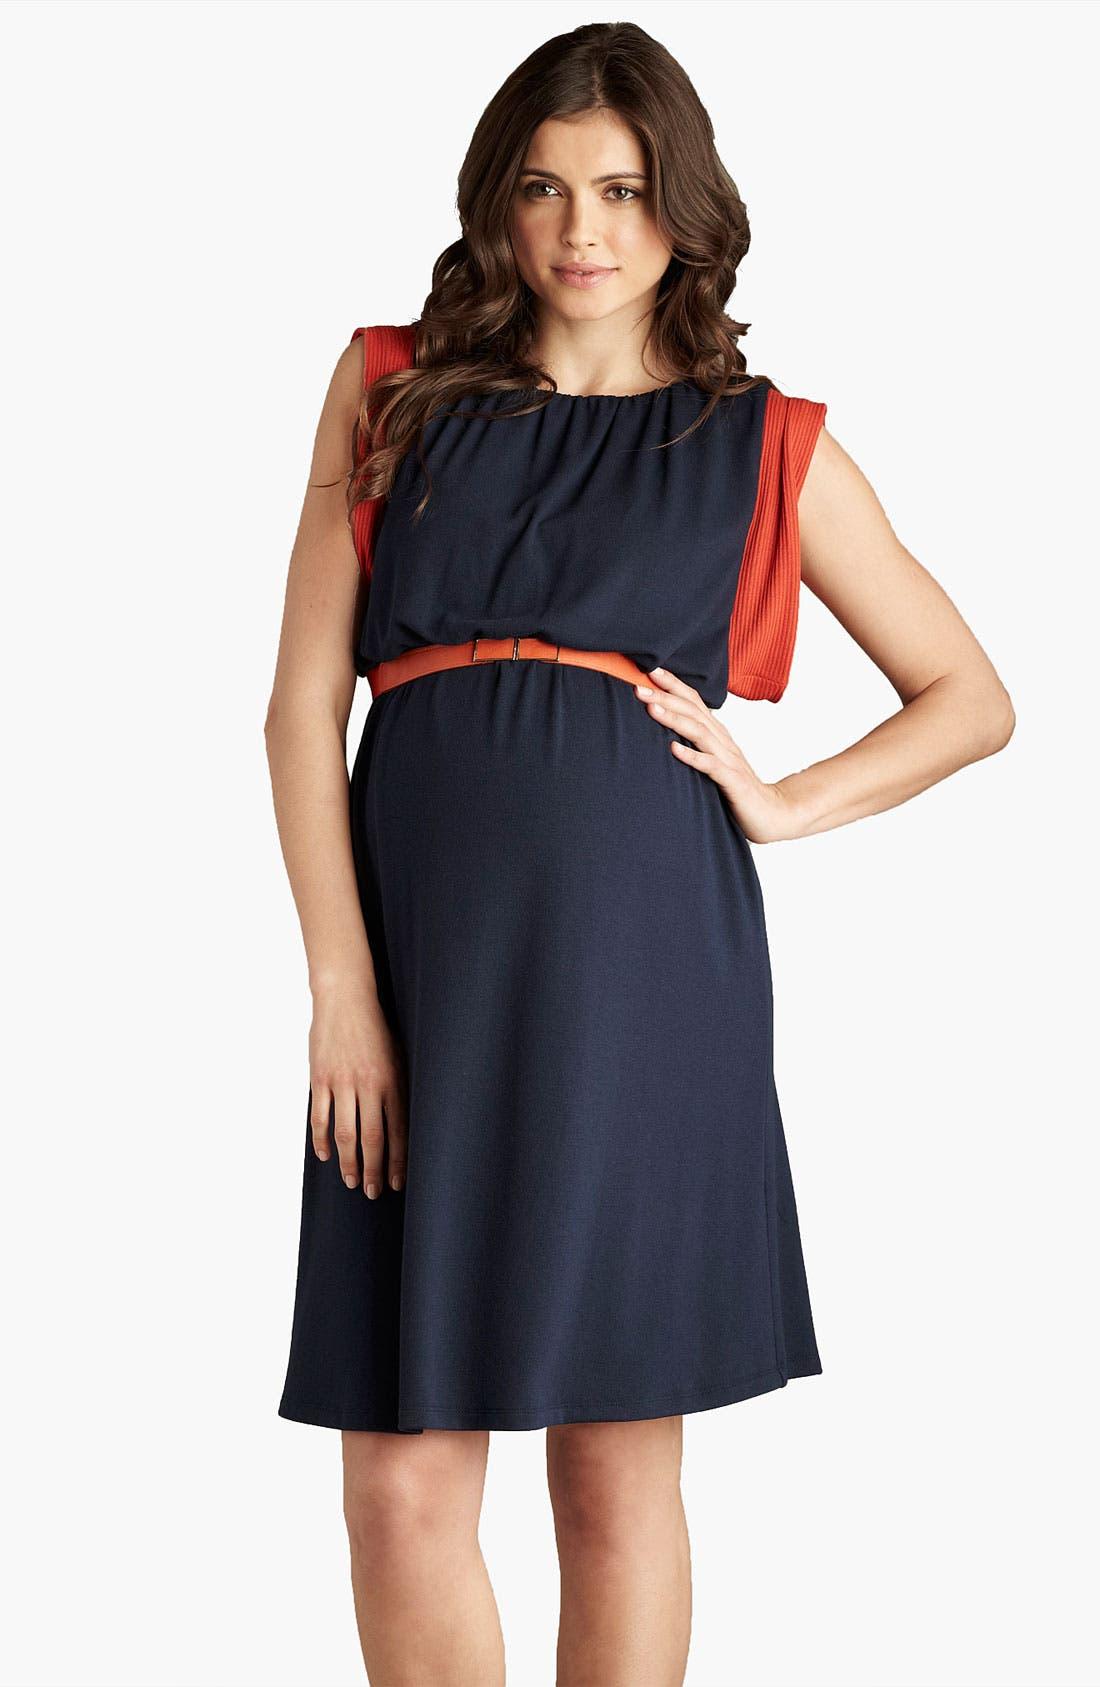 Alternate Image 1 Selected - Maternal America Maternity Belted Knit Dress